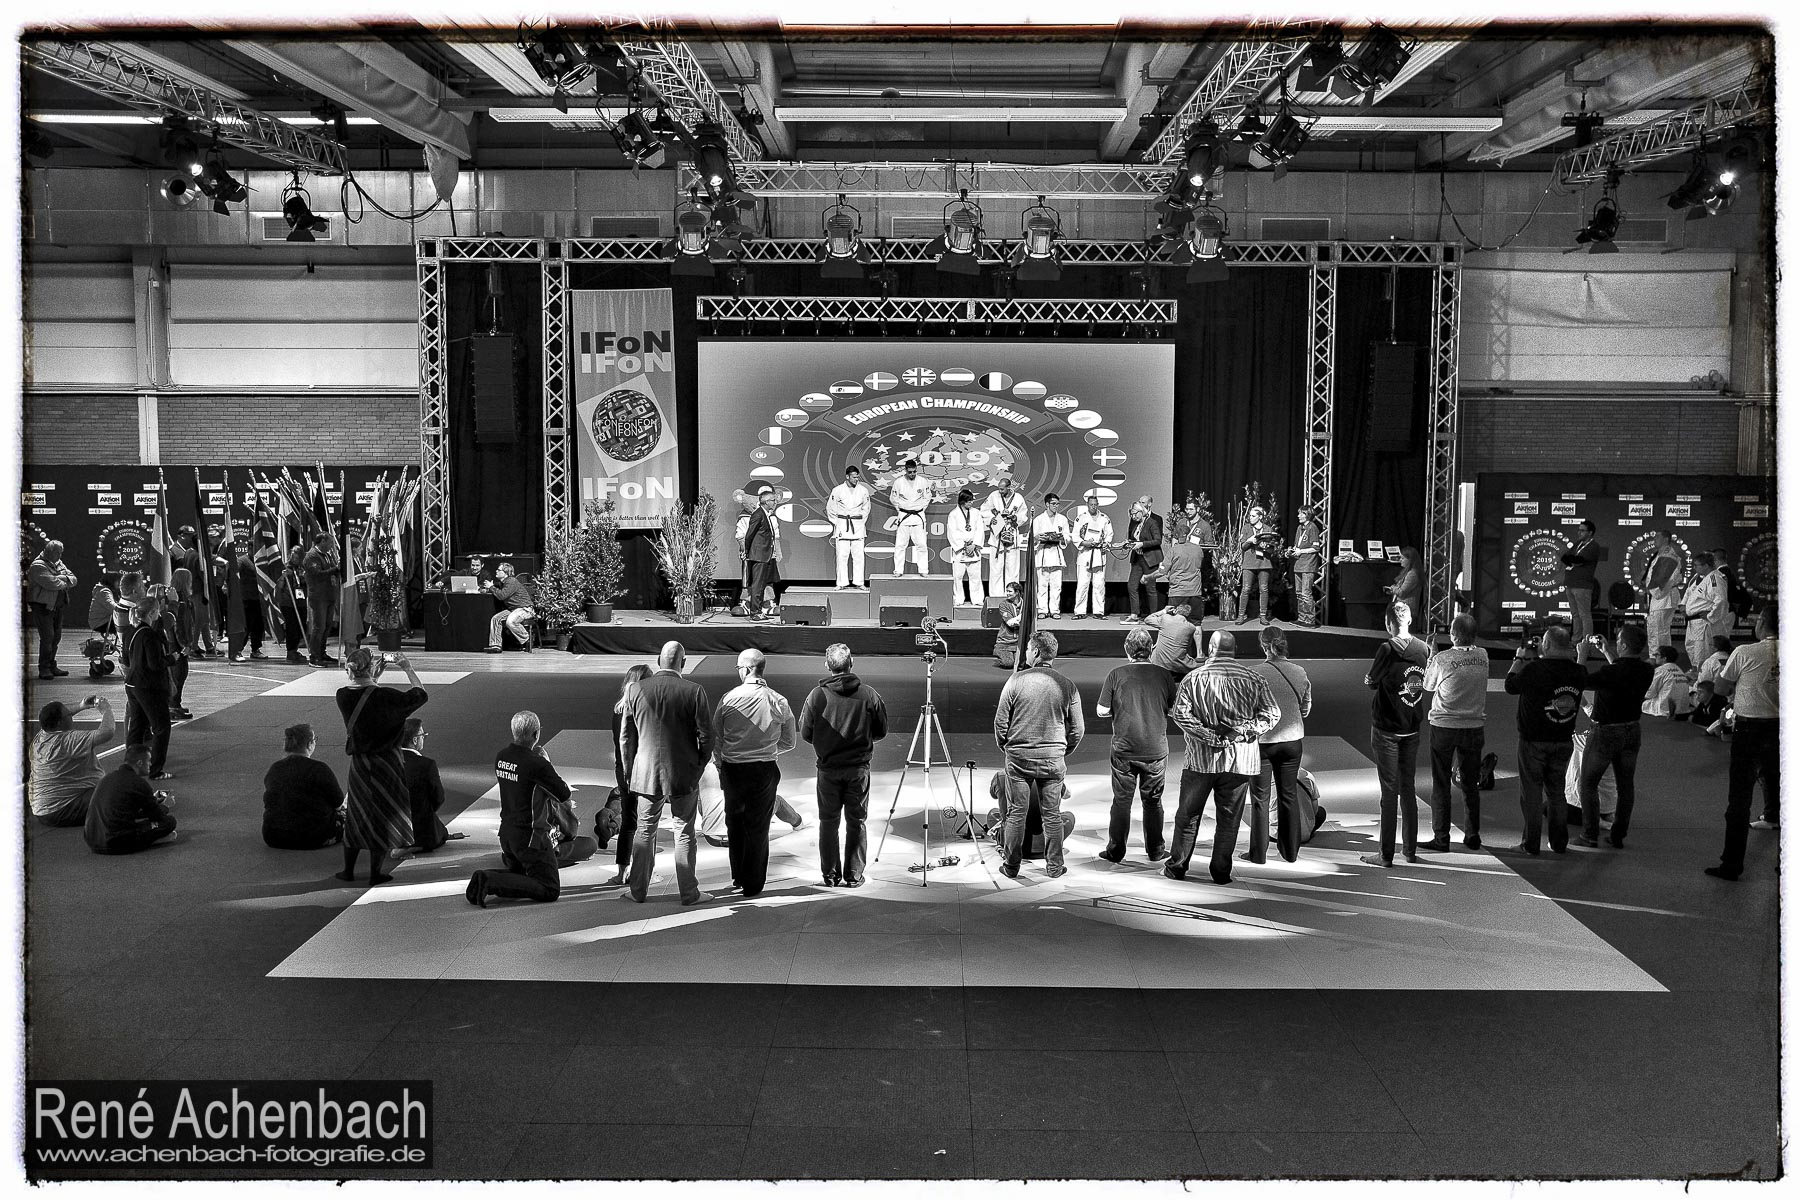 ESSAY zur 2. Judo Europameisterschaft ID-Judo Köln